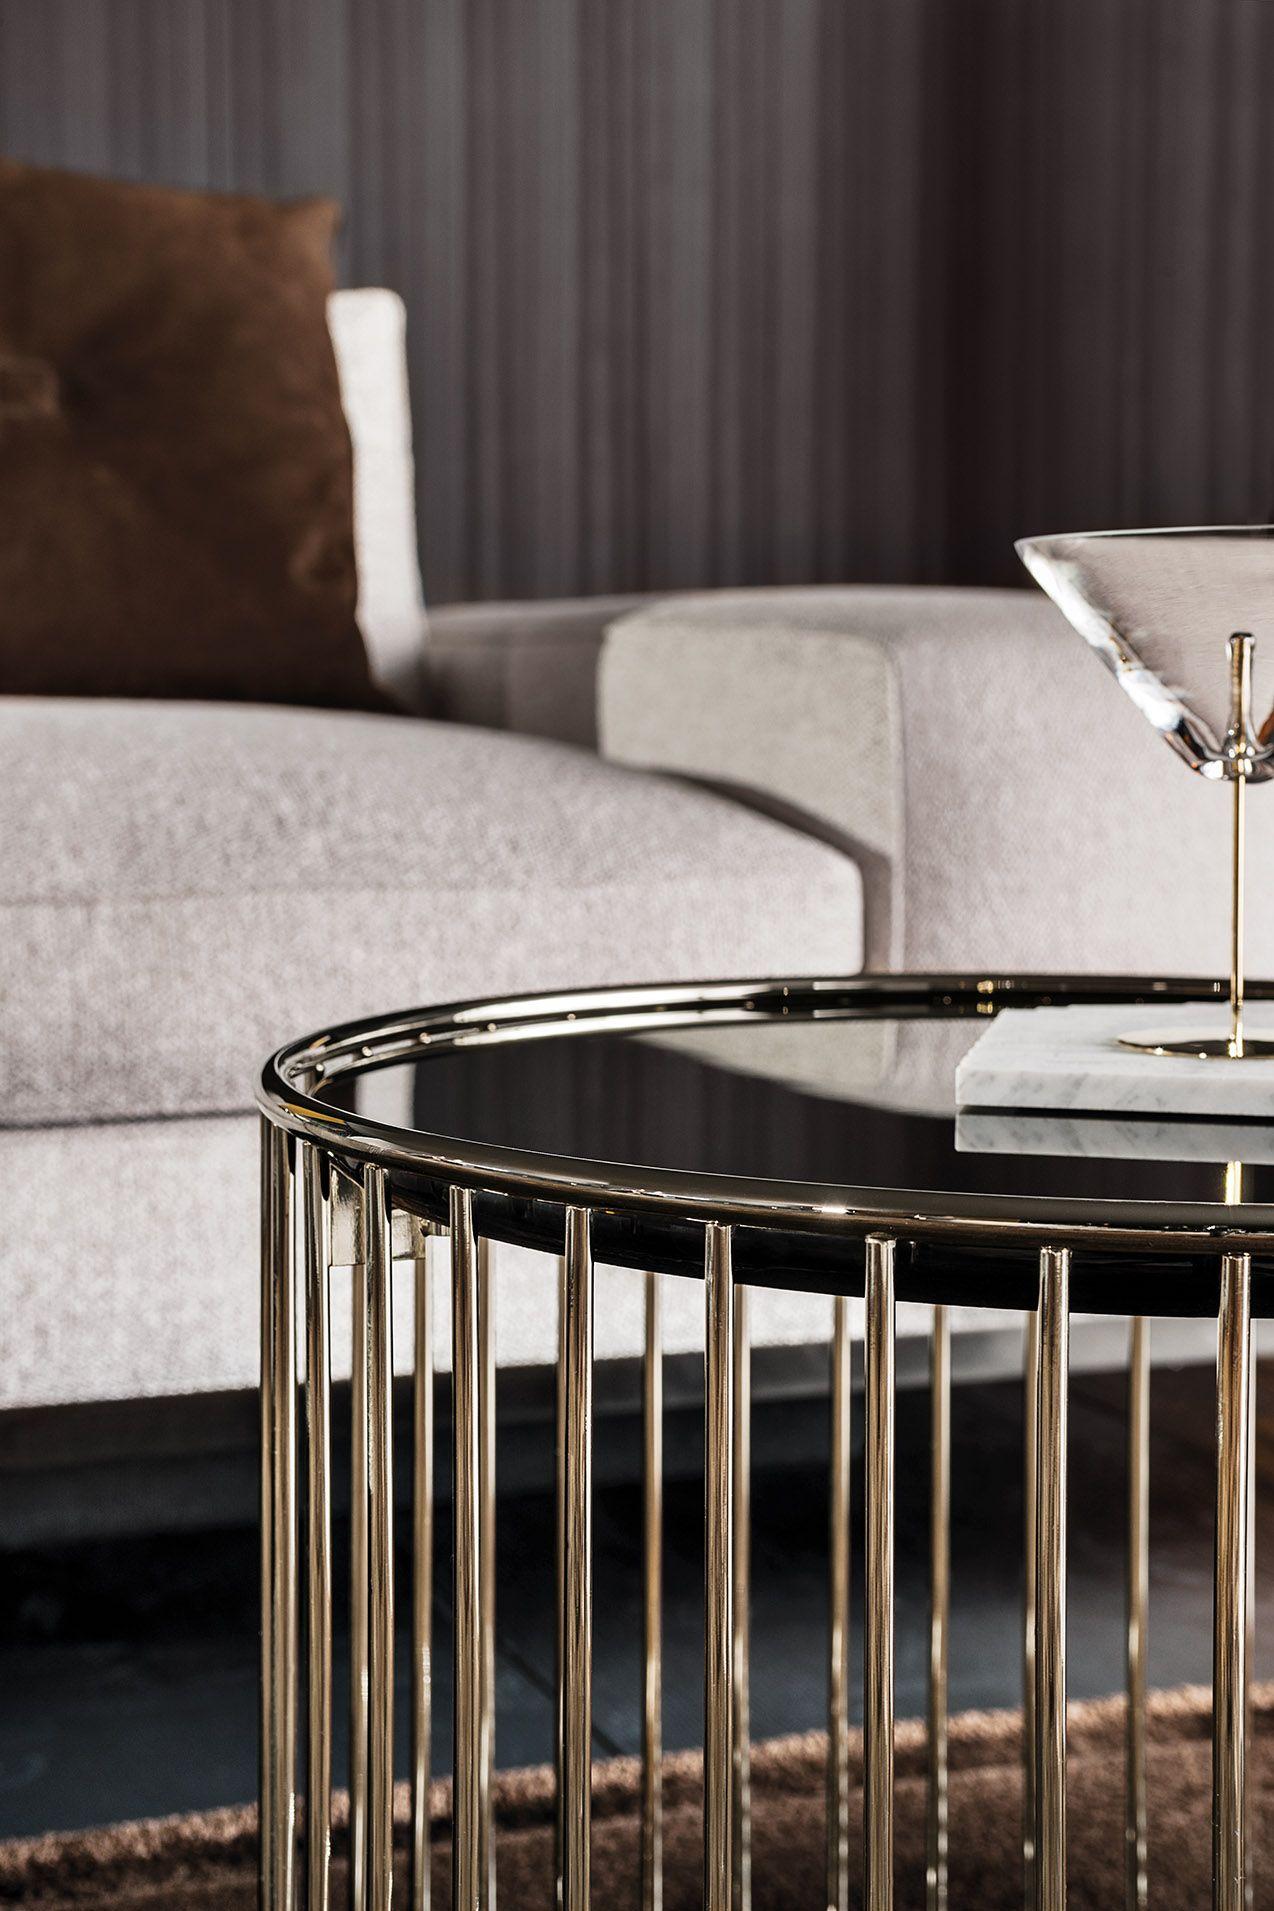 Caulfield Gold Coffee Table, Rodolfo Dordoni Design #Minotti #Furniture #